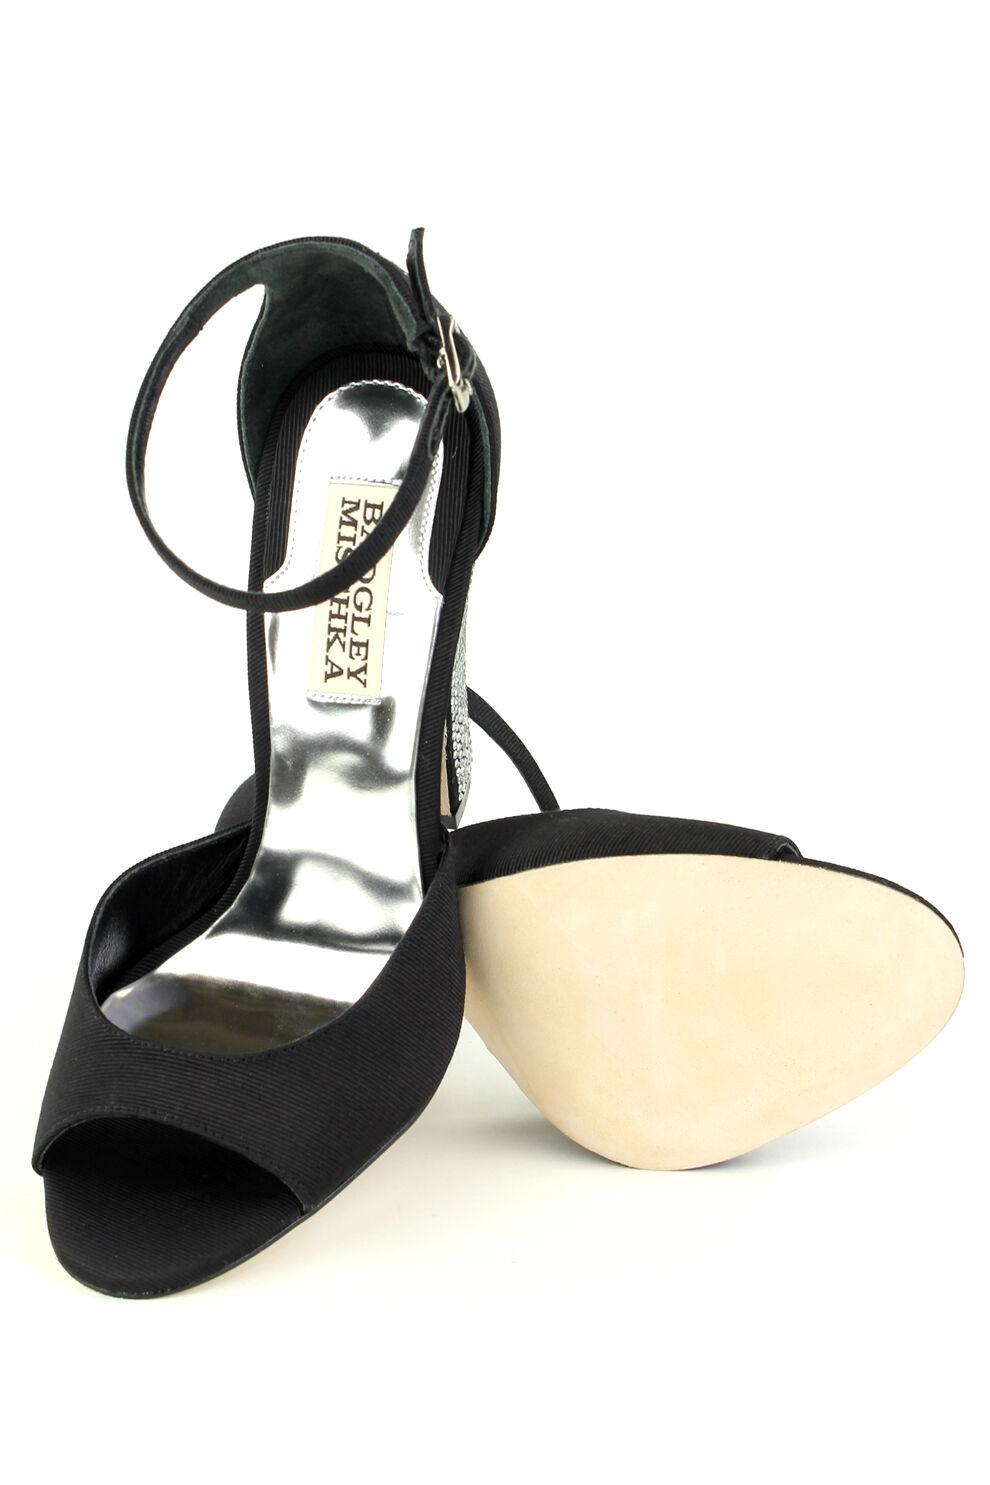 Badgley Badgley Badgley Mischka WYNTER Sandals in noir Brand New in Box Retail  245 Jeweled 6531cd